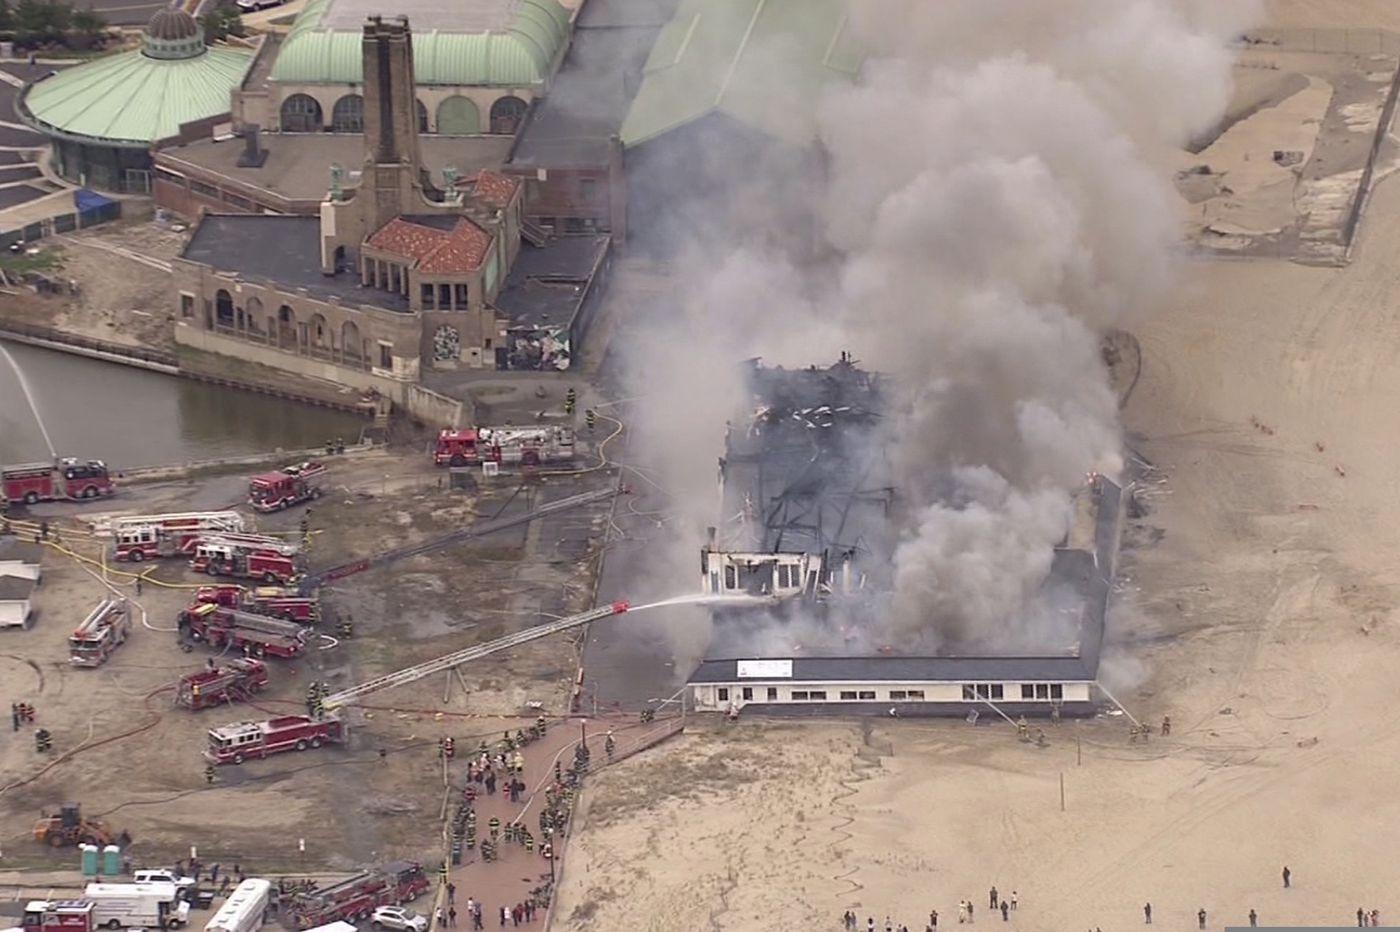 Cause of massive blaze that destroyed boardwalk cafe sought